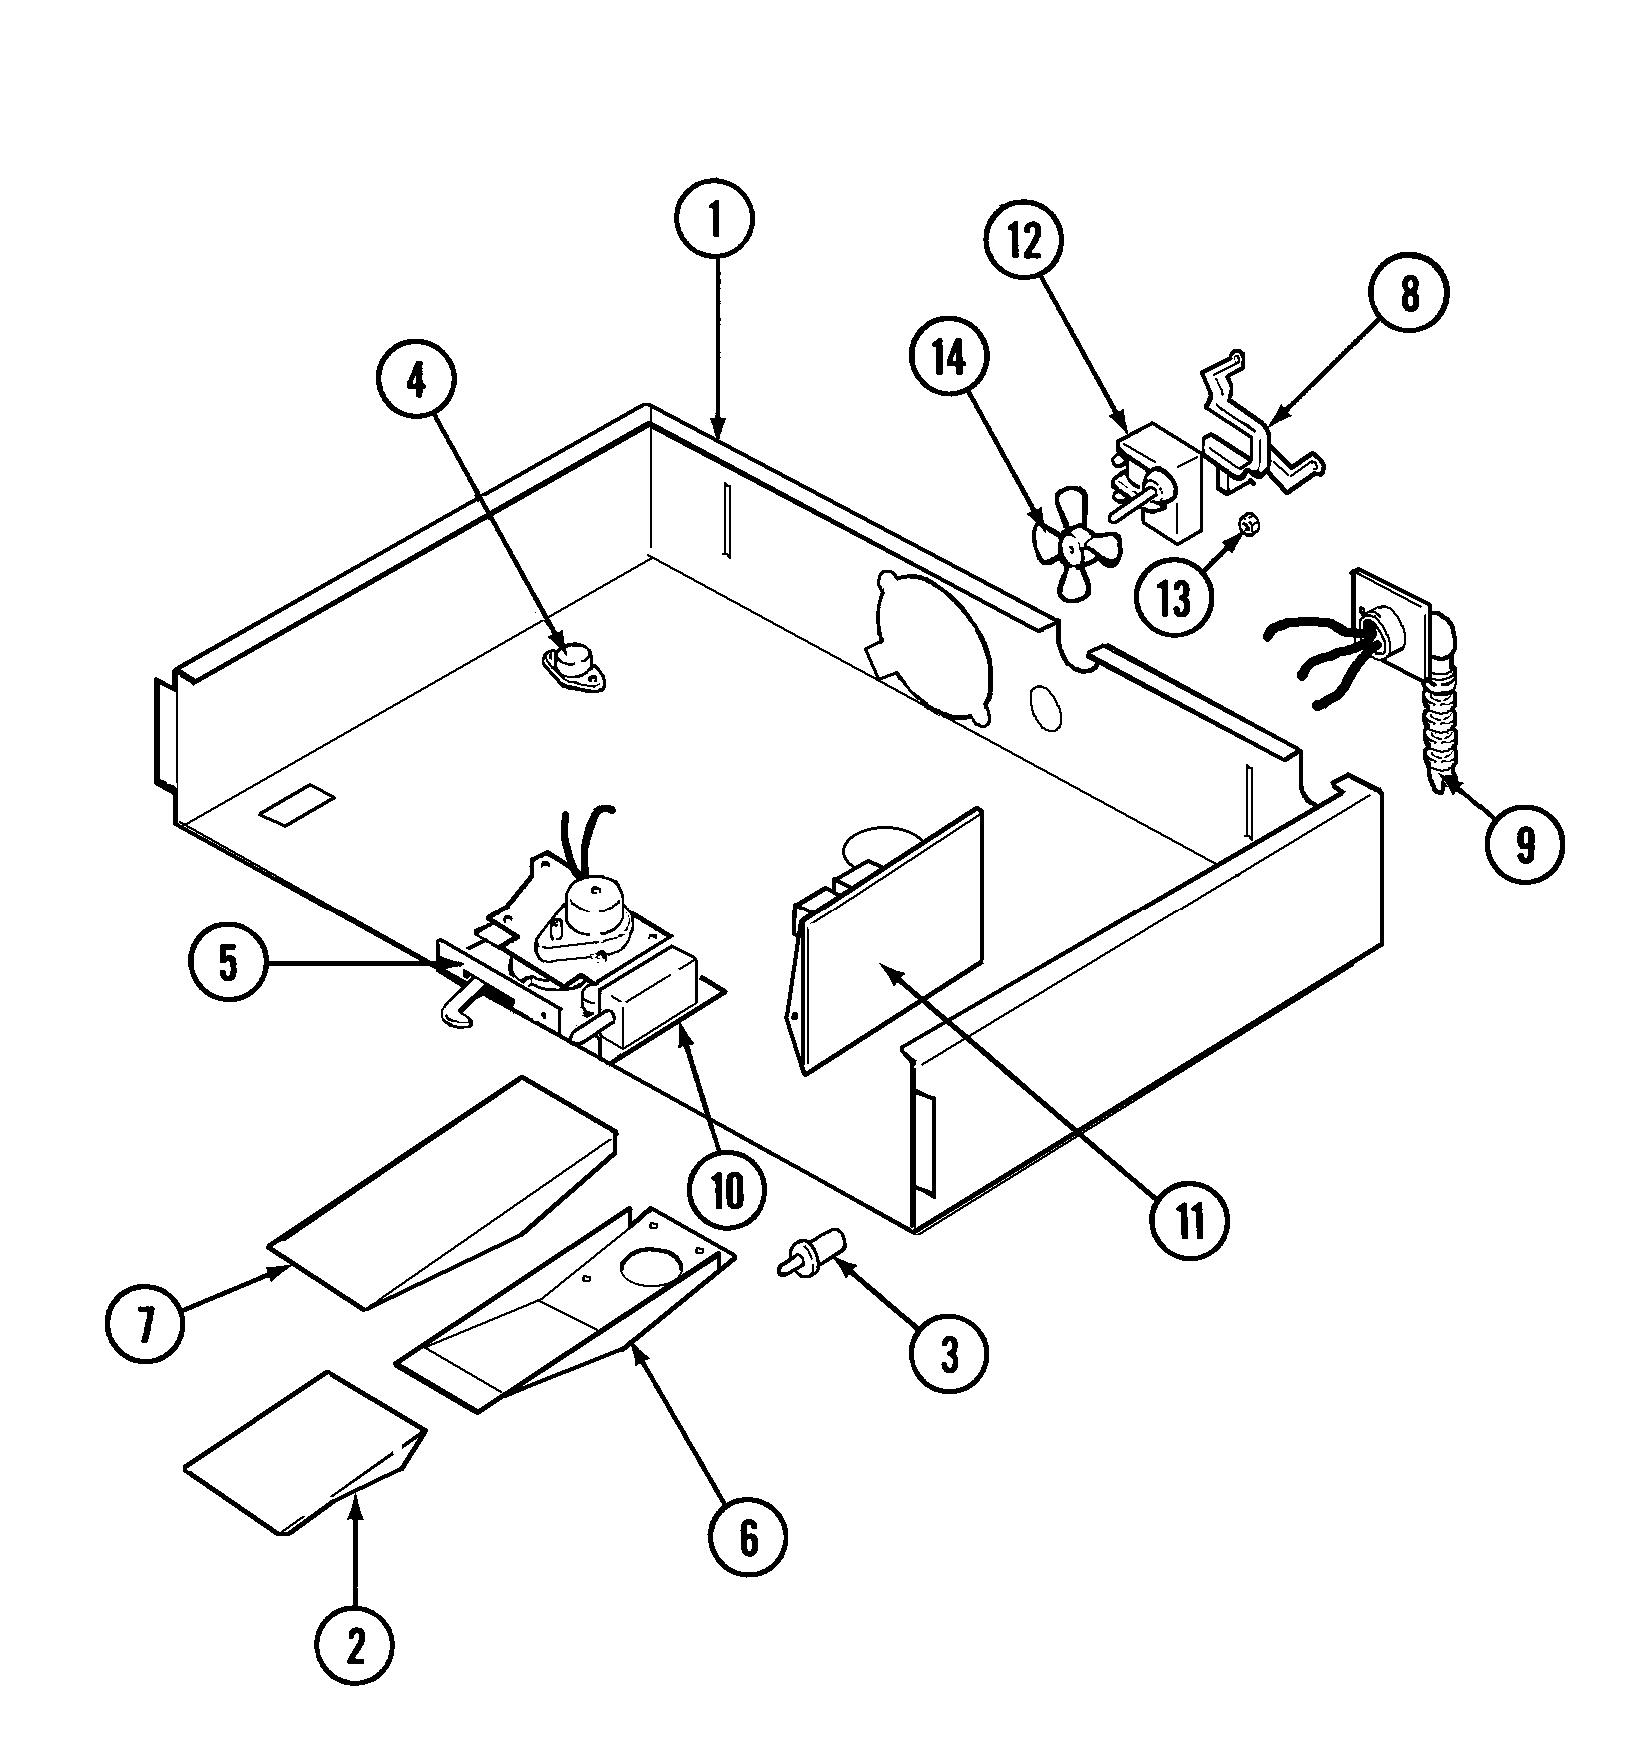 Kitchenaid Range Wiring Diagram Whirlpool Range Wiring Diagram – Imperial Range Wiring Diagram